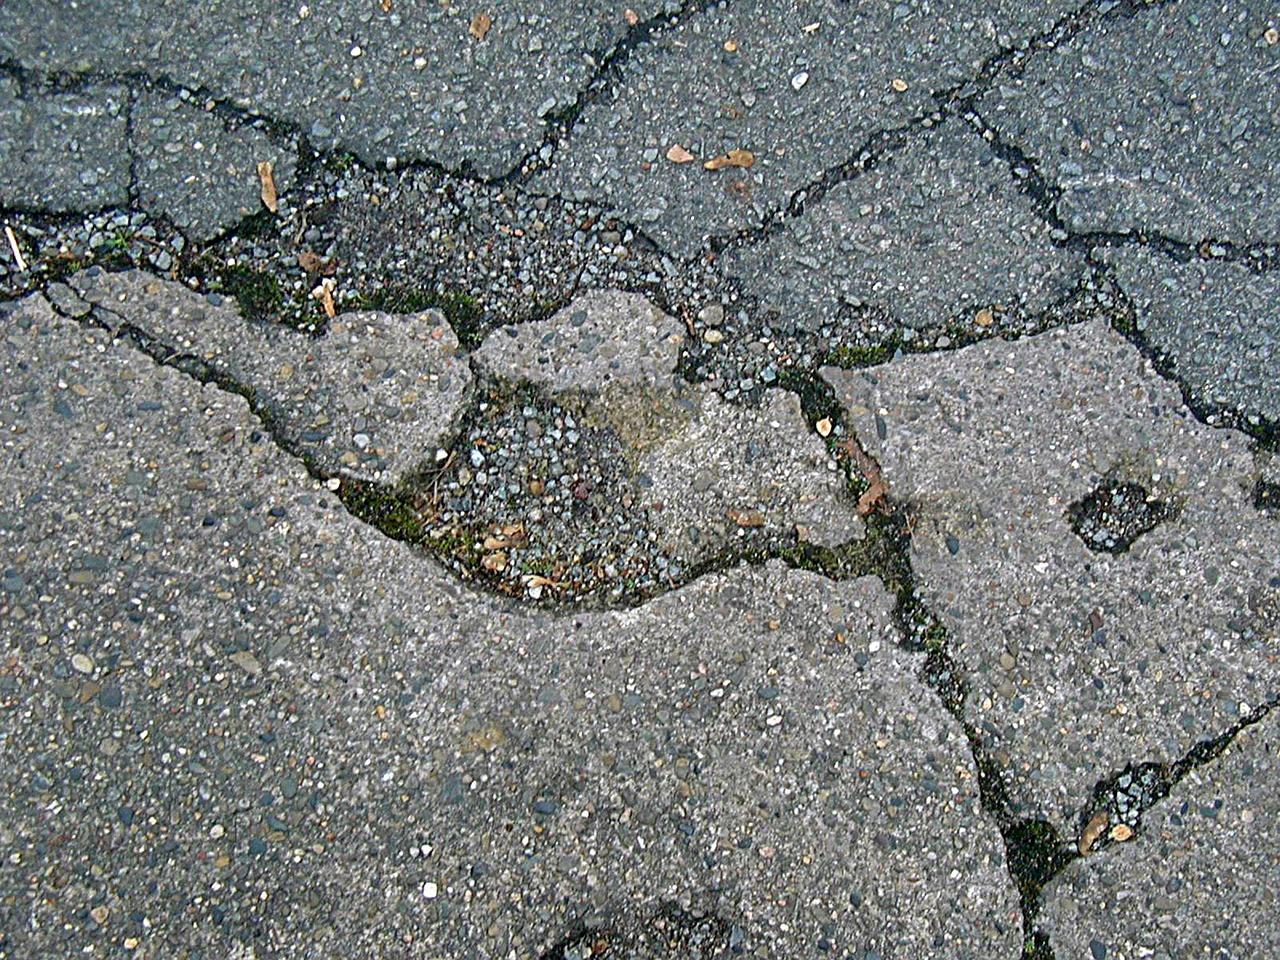 road-damage-232343_1280